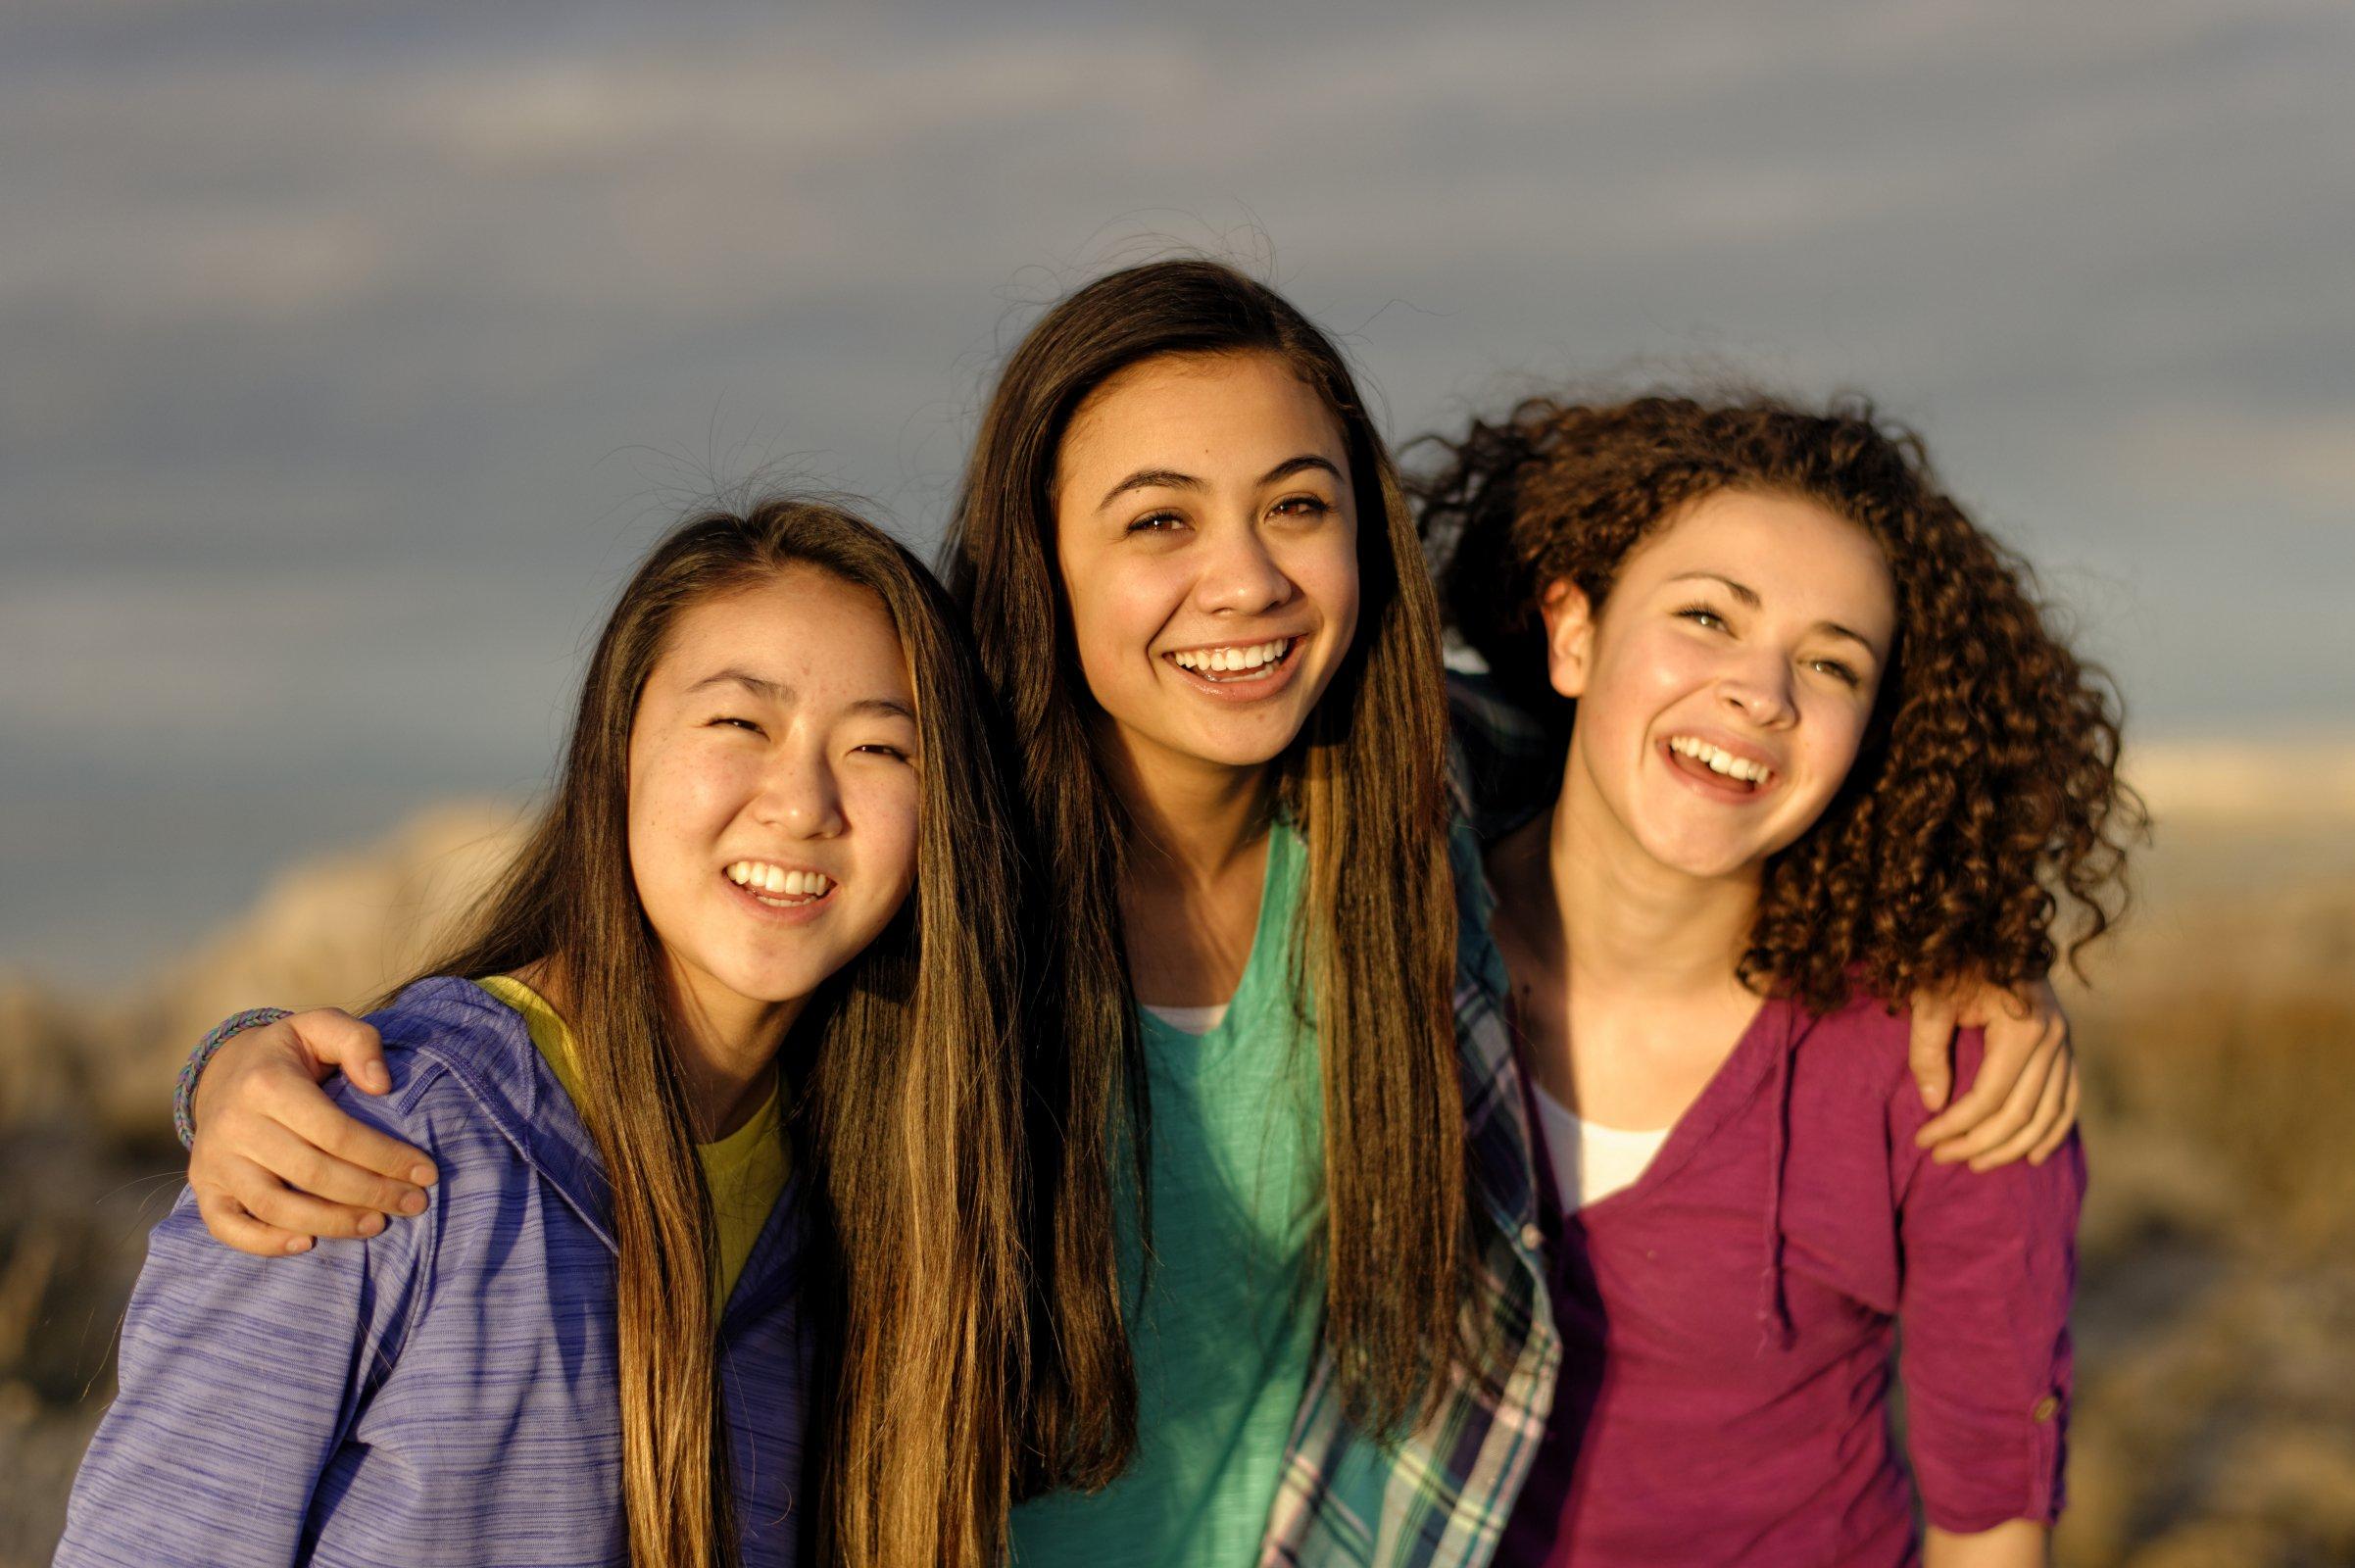 girls-camp-antelope-island-beach-woman-young-women-1246748-wallpaper